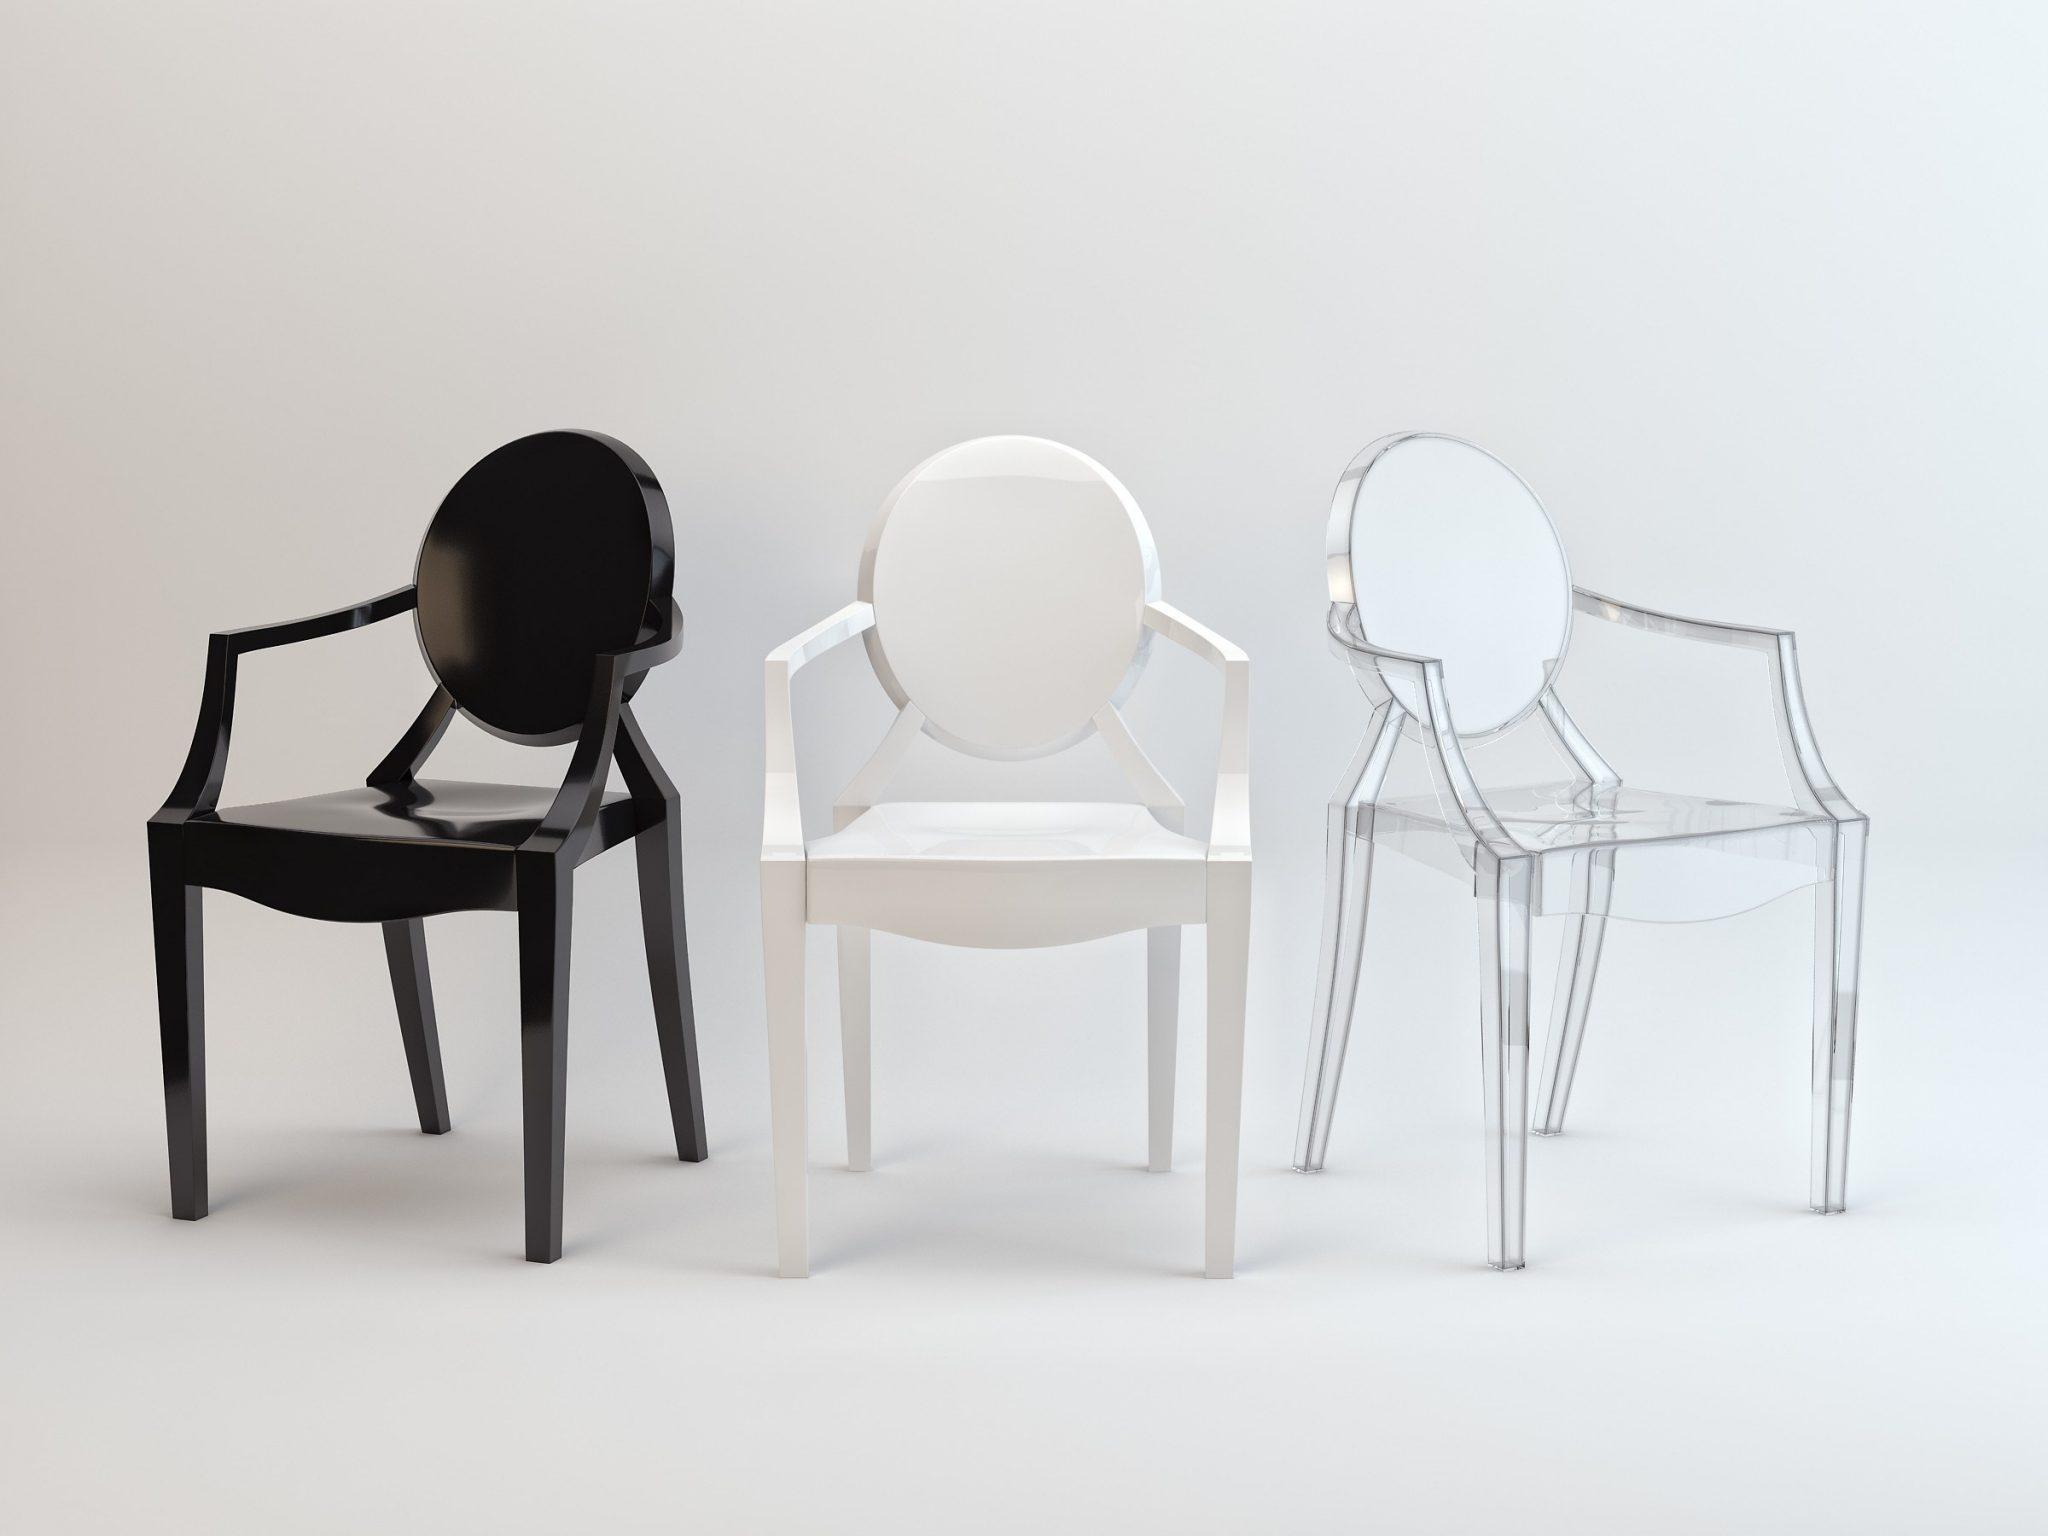 O Design Democrático de Philippe Starck